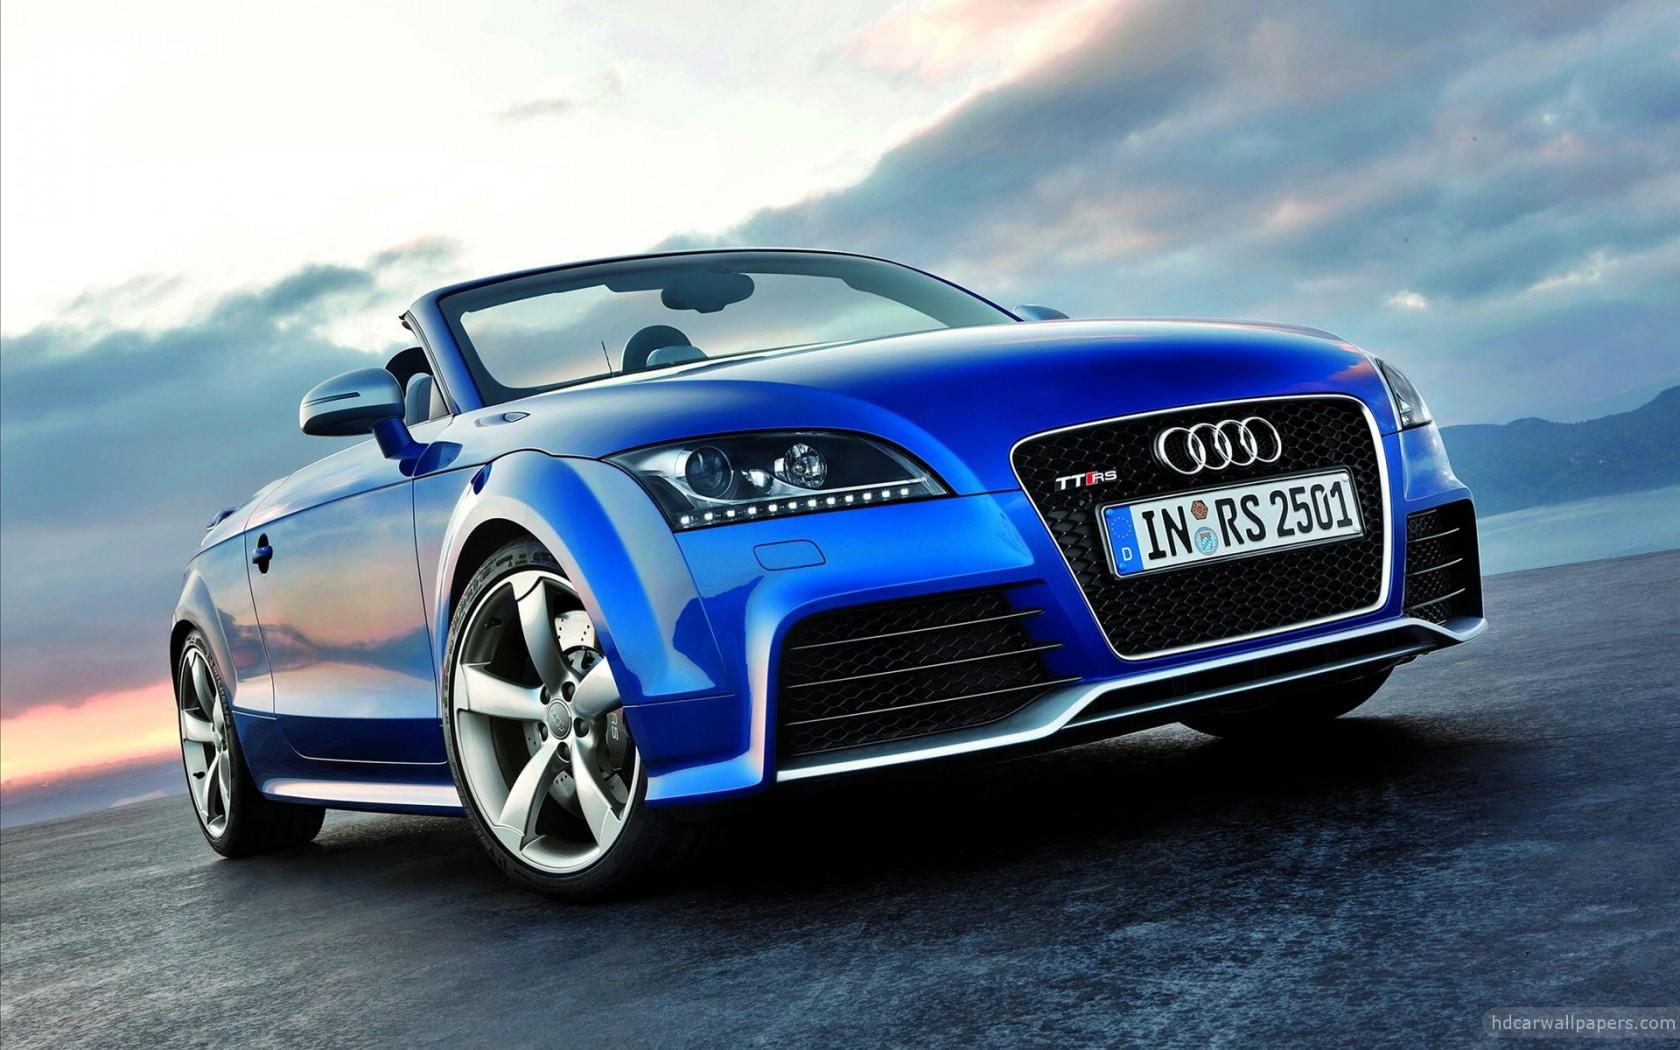 2012 Audi TT RS Wallpaper HD Car Wallpapers 1680x1050